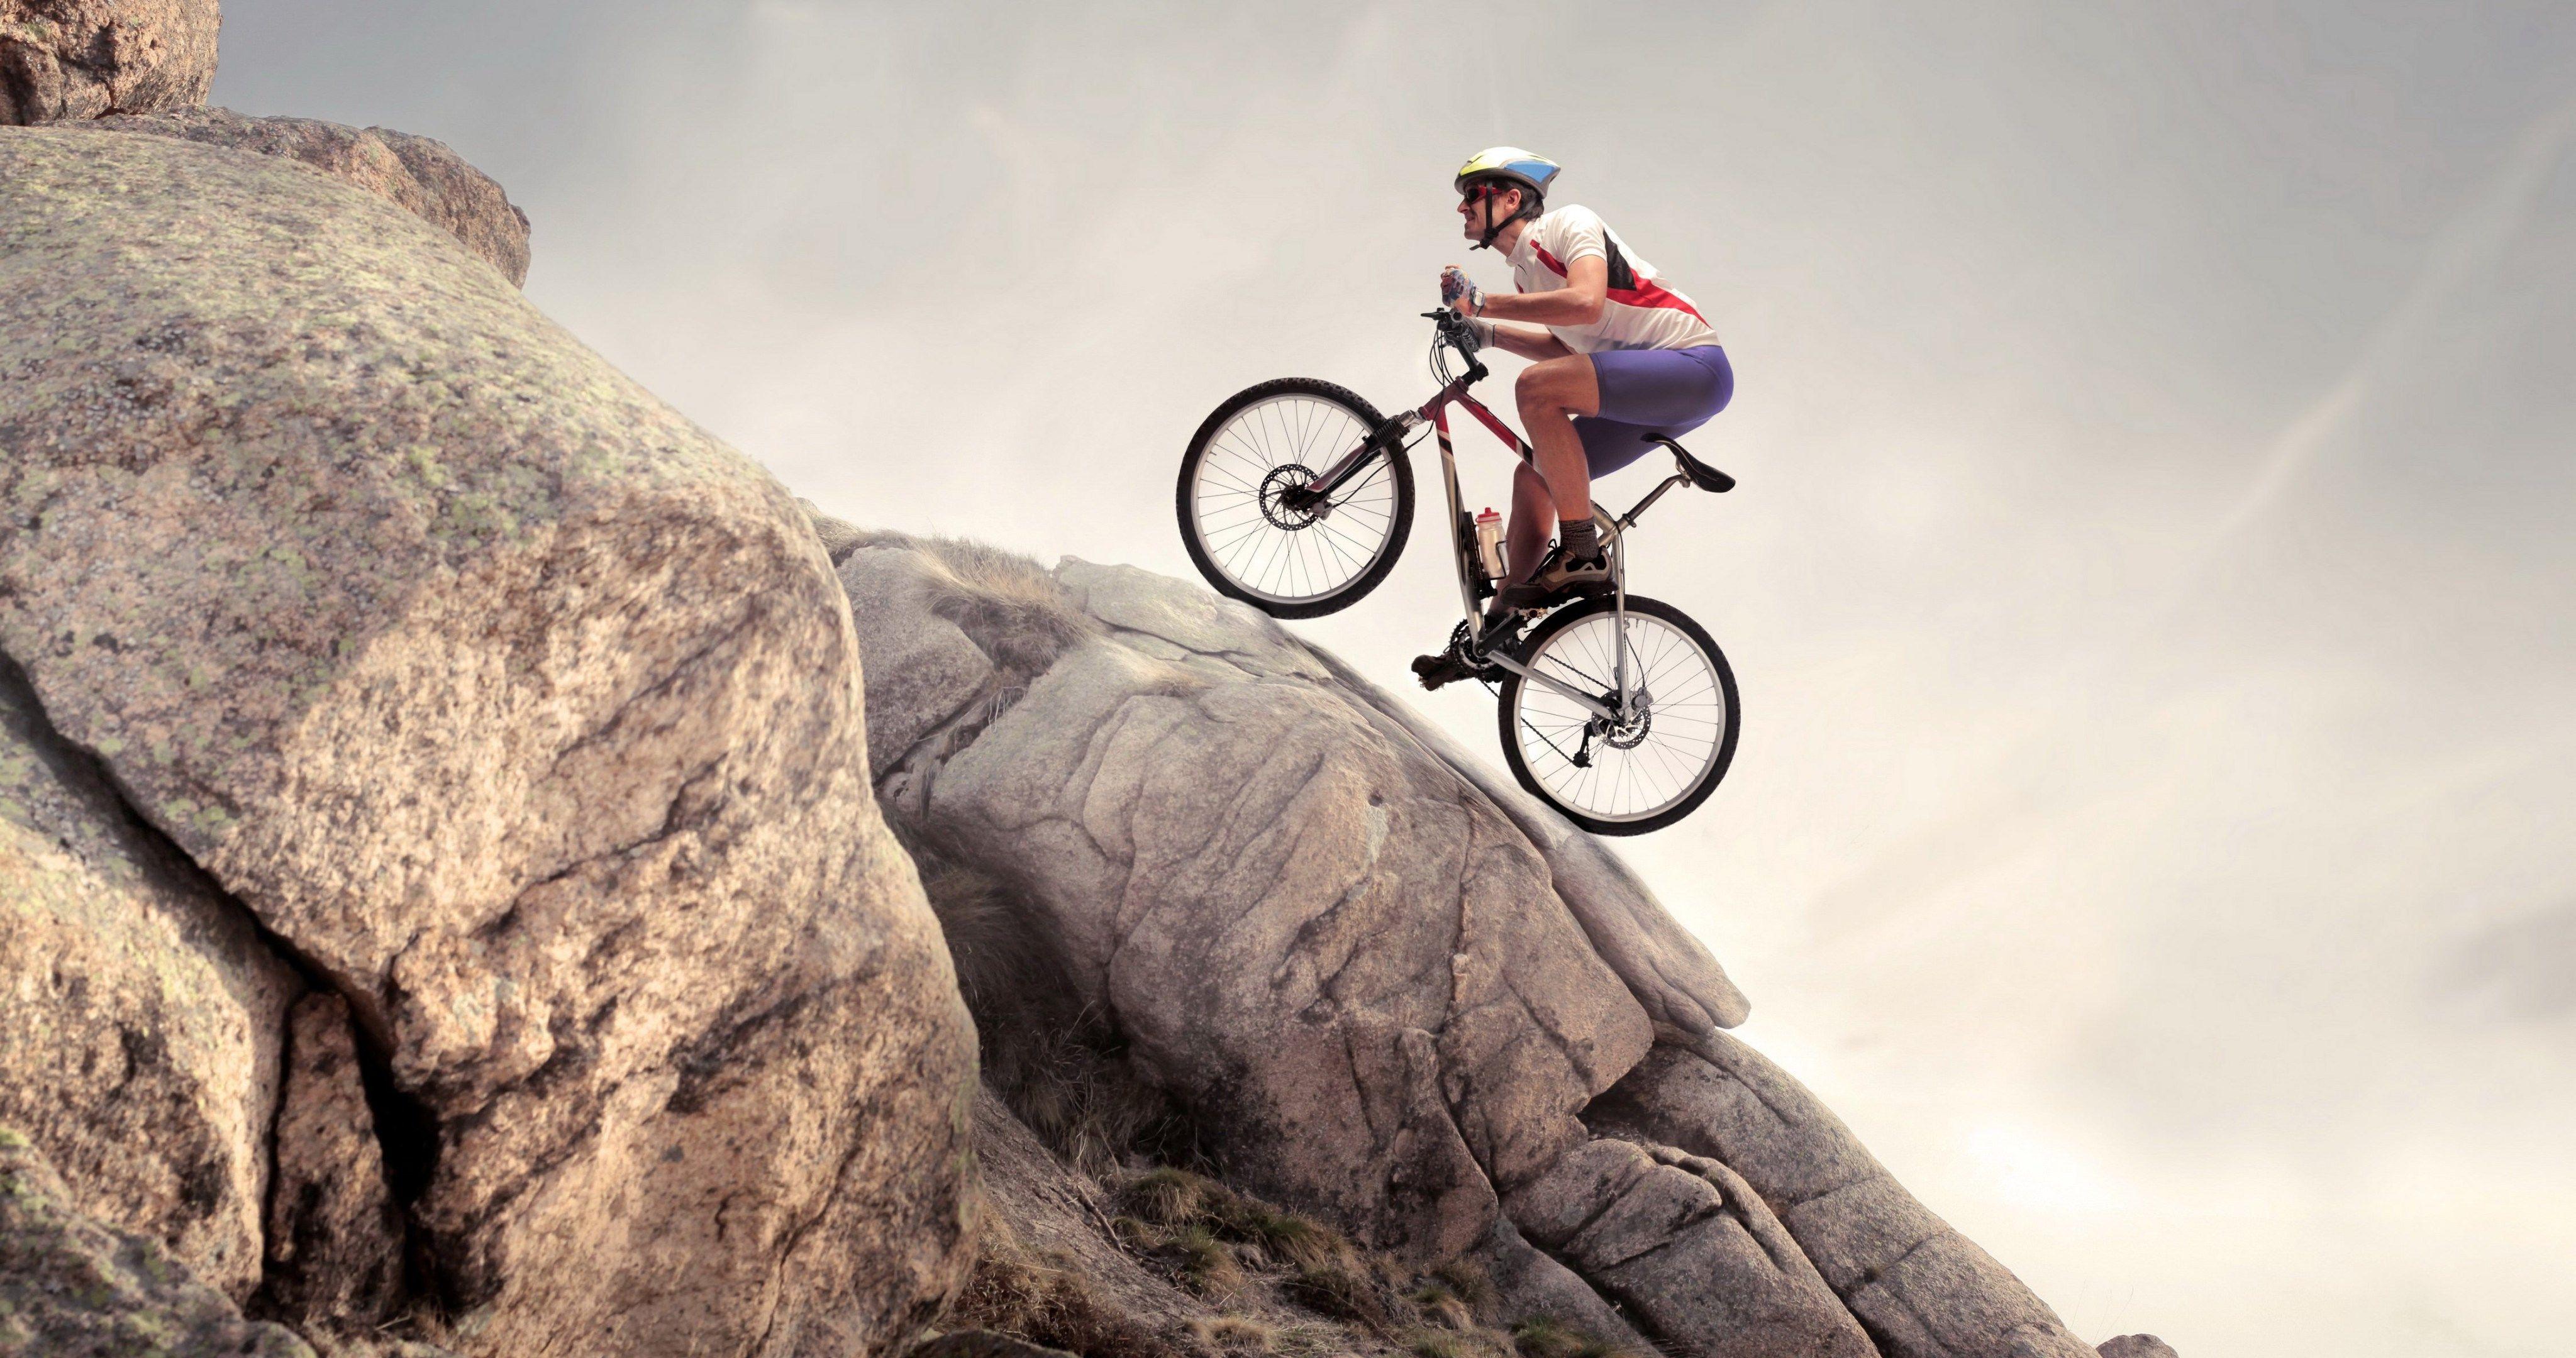 Mountain Biking Hd 4k Ultra Hd Wallpaper Ololoshenka Pinterest